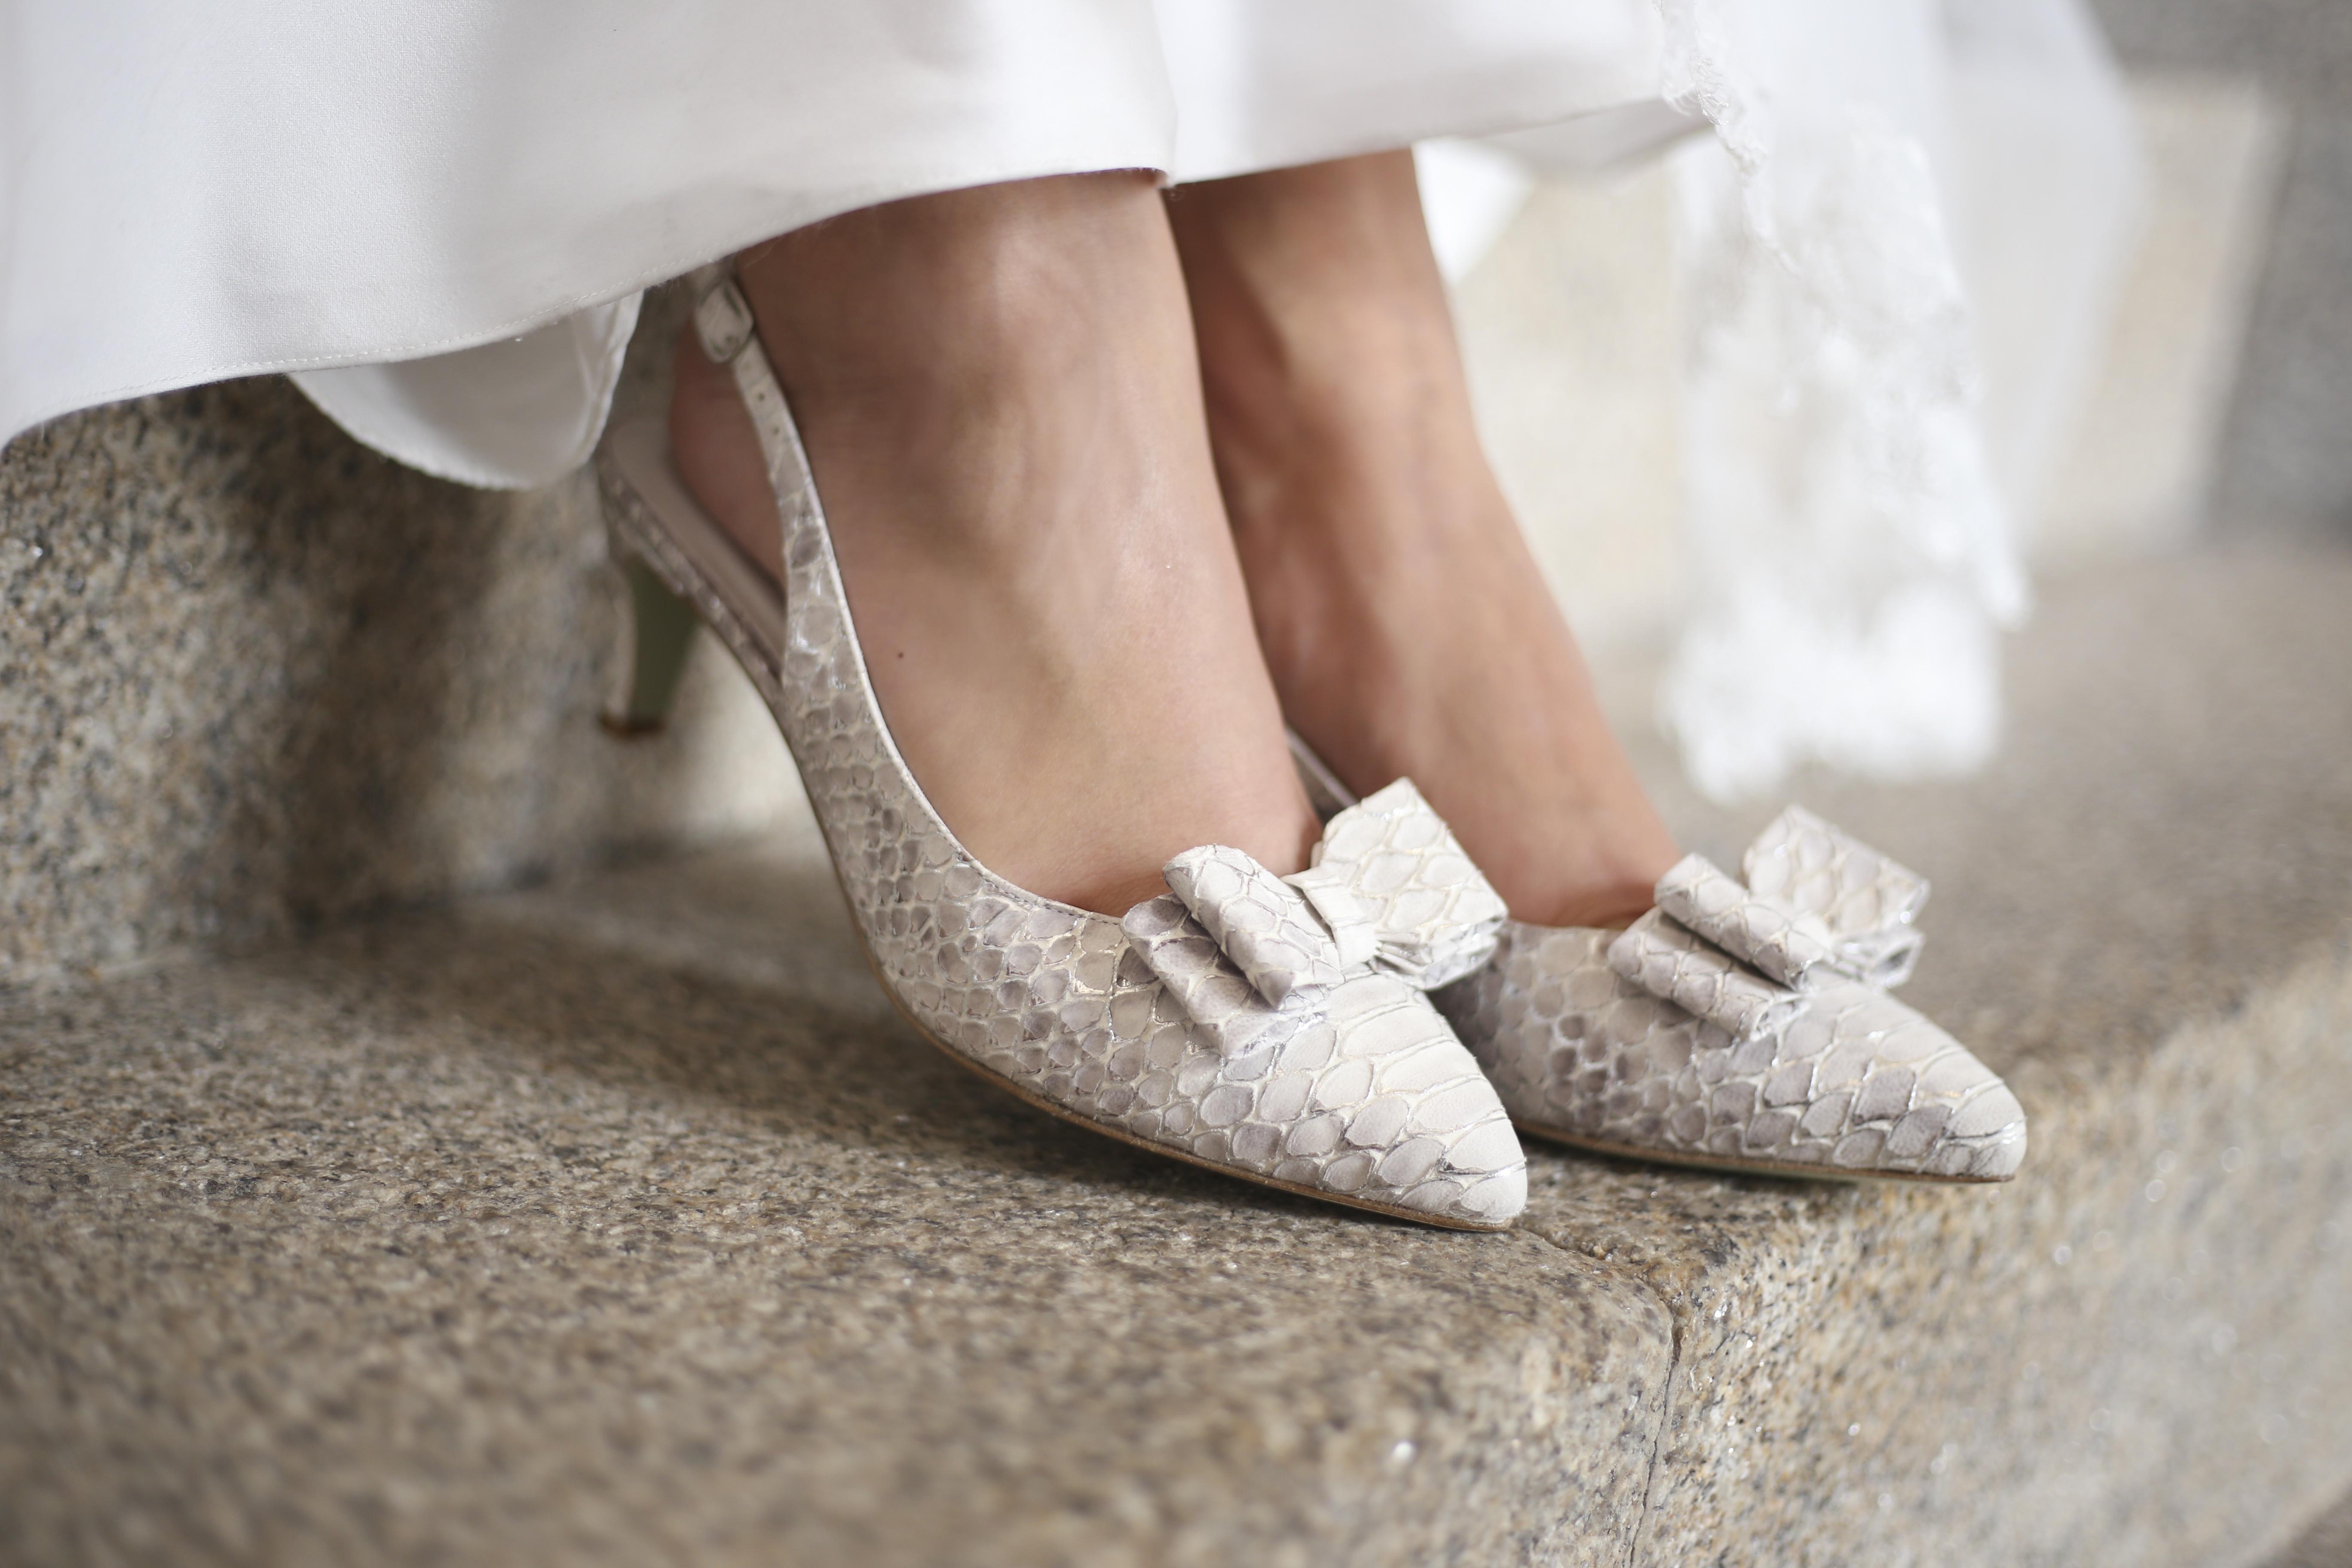 Dance 0 - Sapatos de noiva personalizados